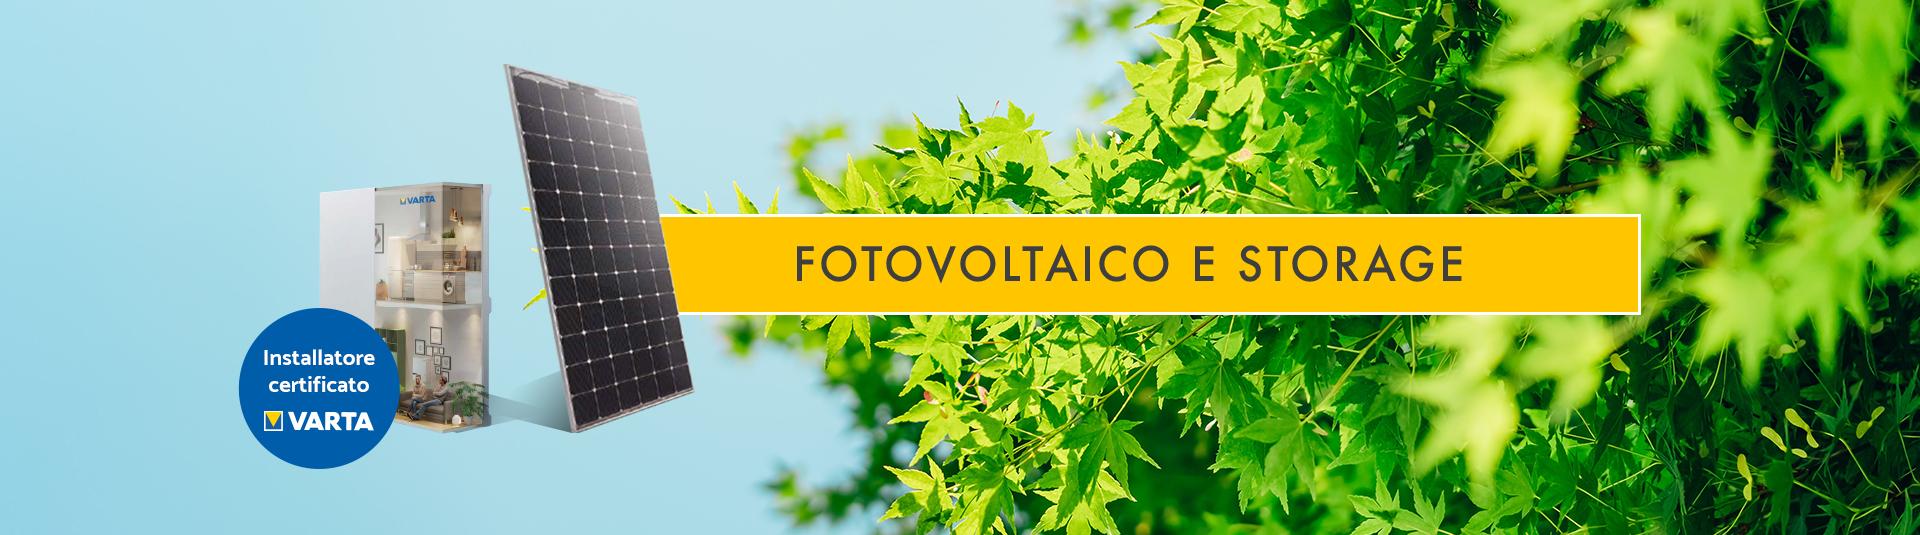 Fotovoltaico & Storage